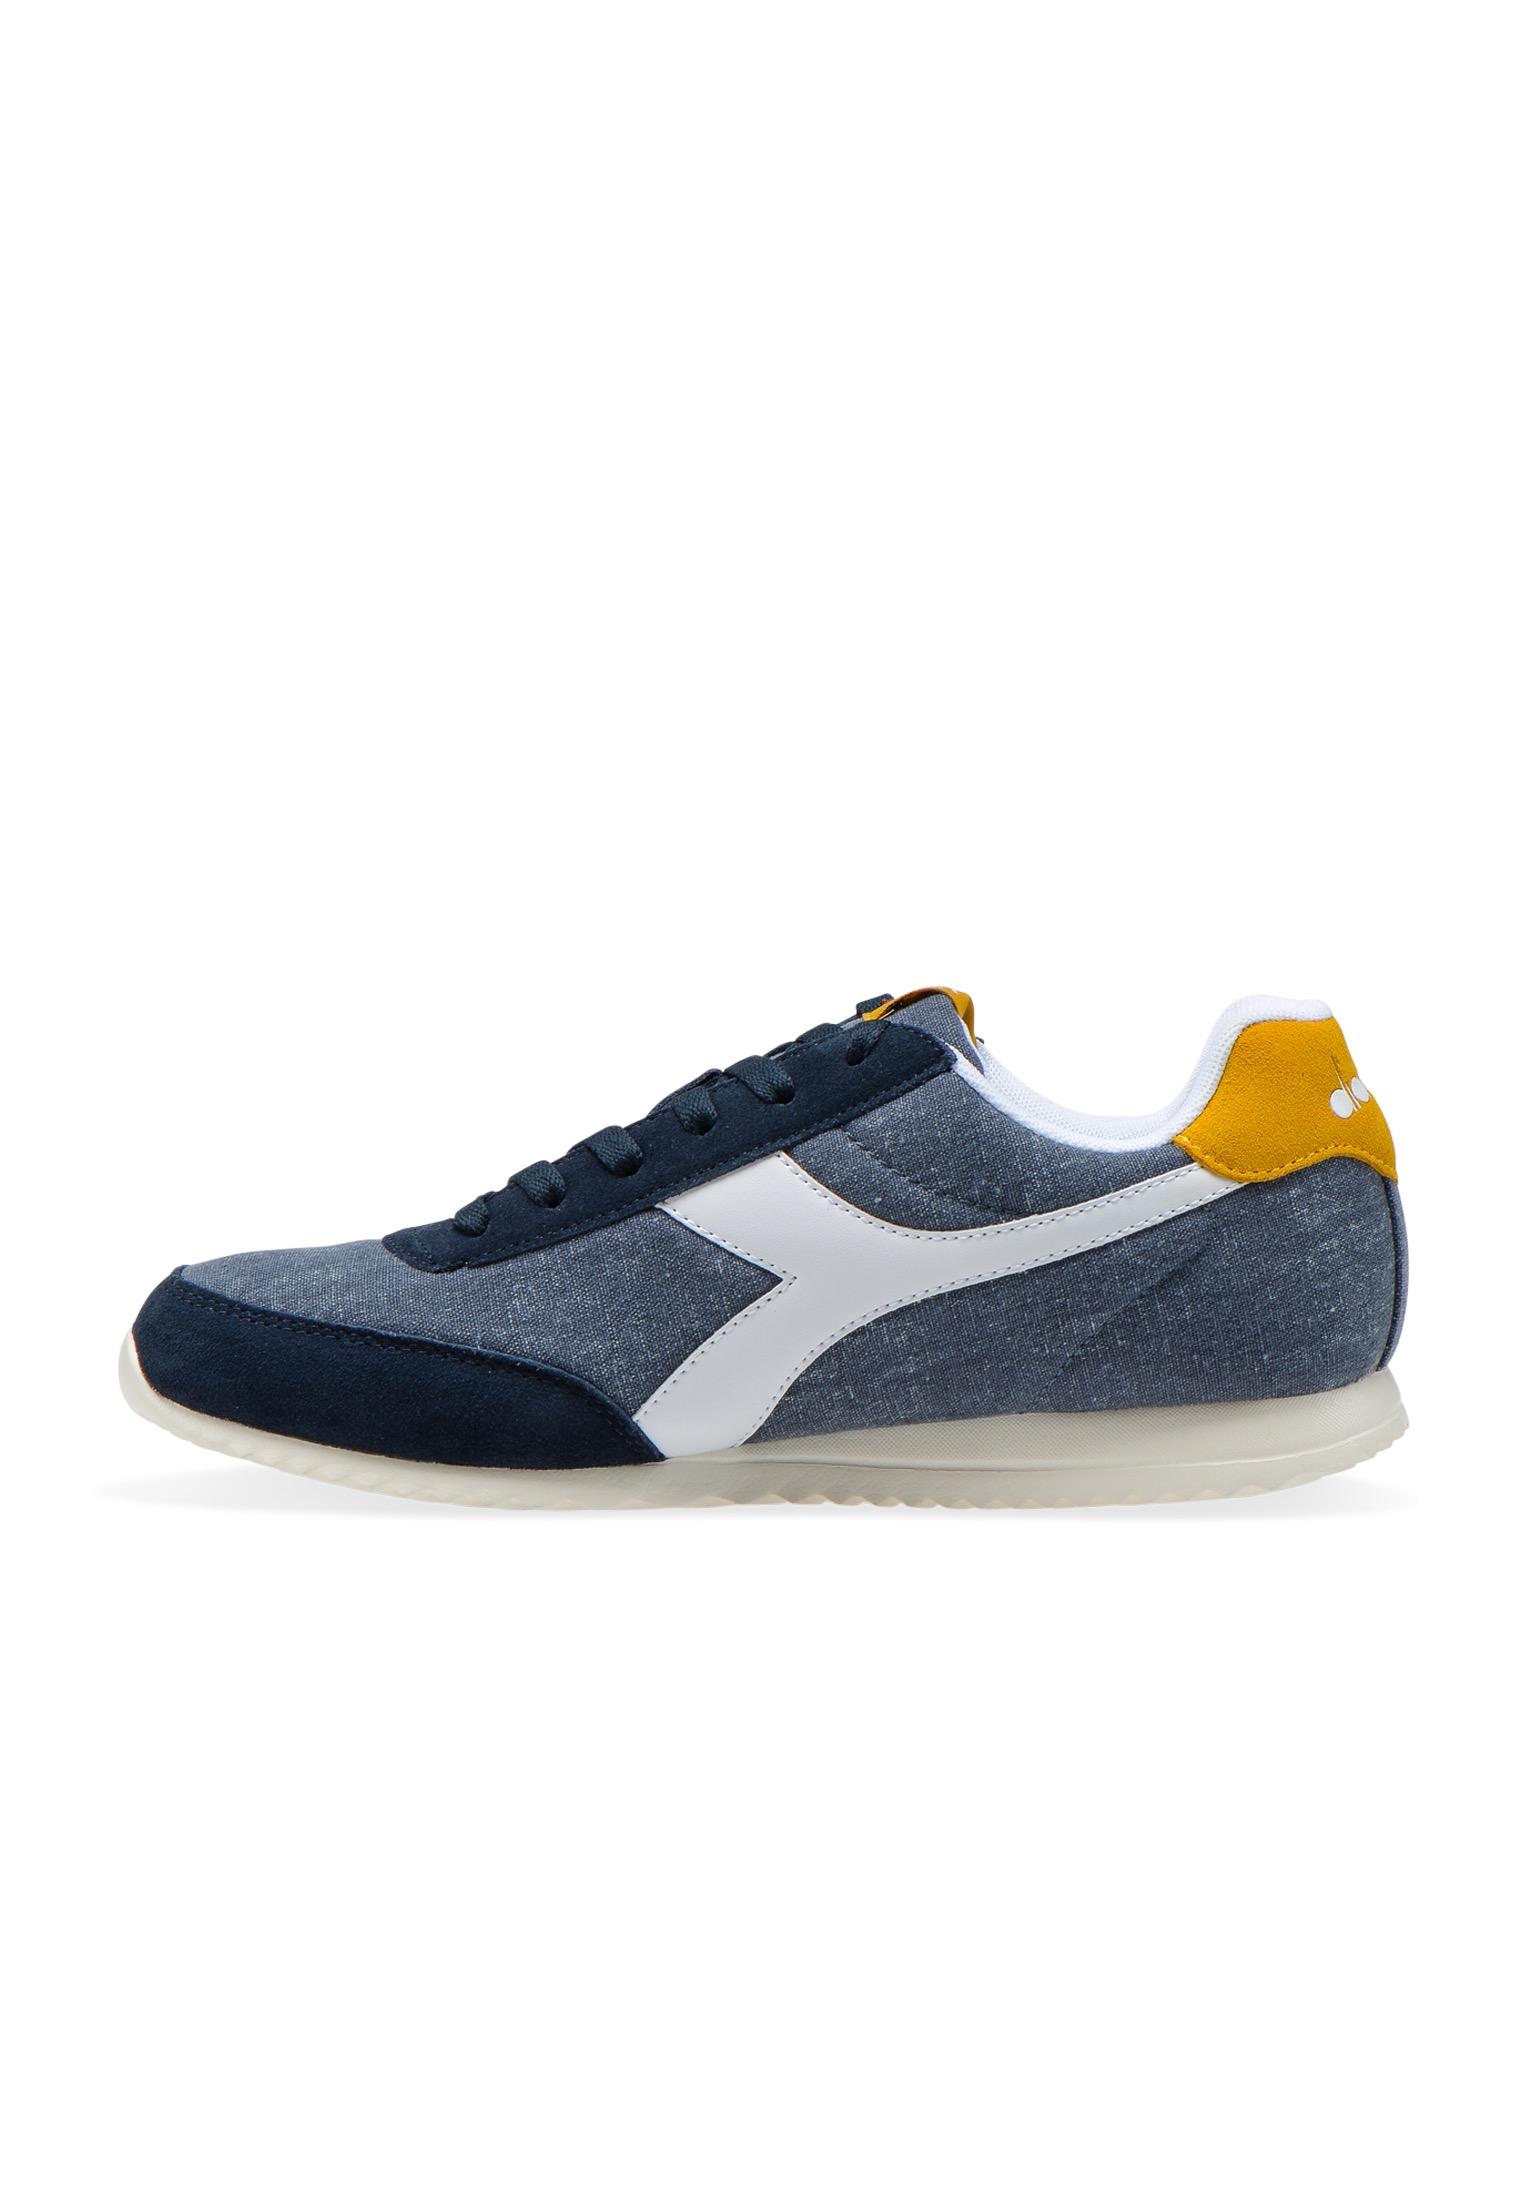 Scarpe-Diadora-Jog-Light-C-Sneakers-sportive-uomo-donna-vari-colori-e-taglie miniatura 57